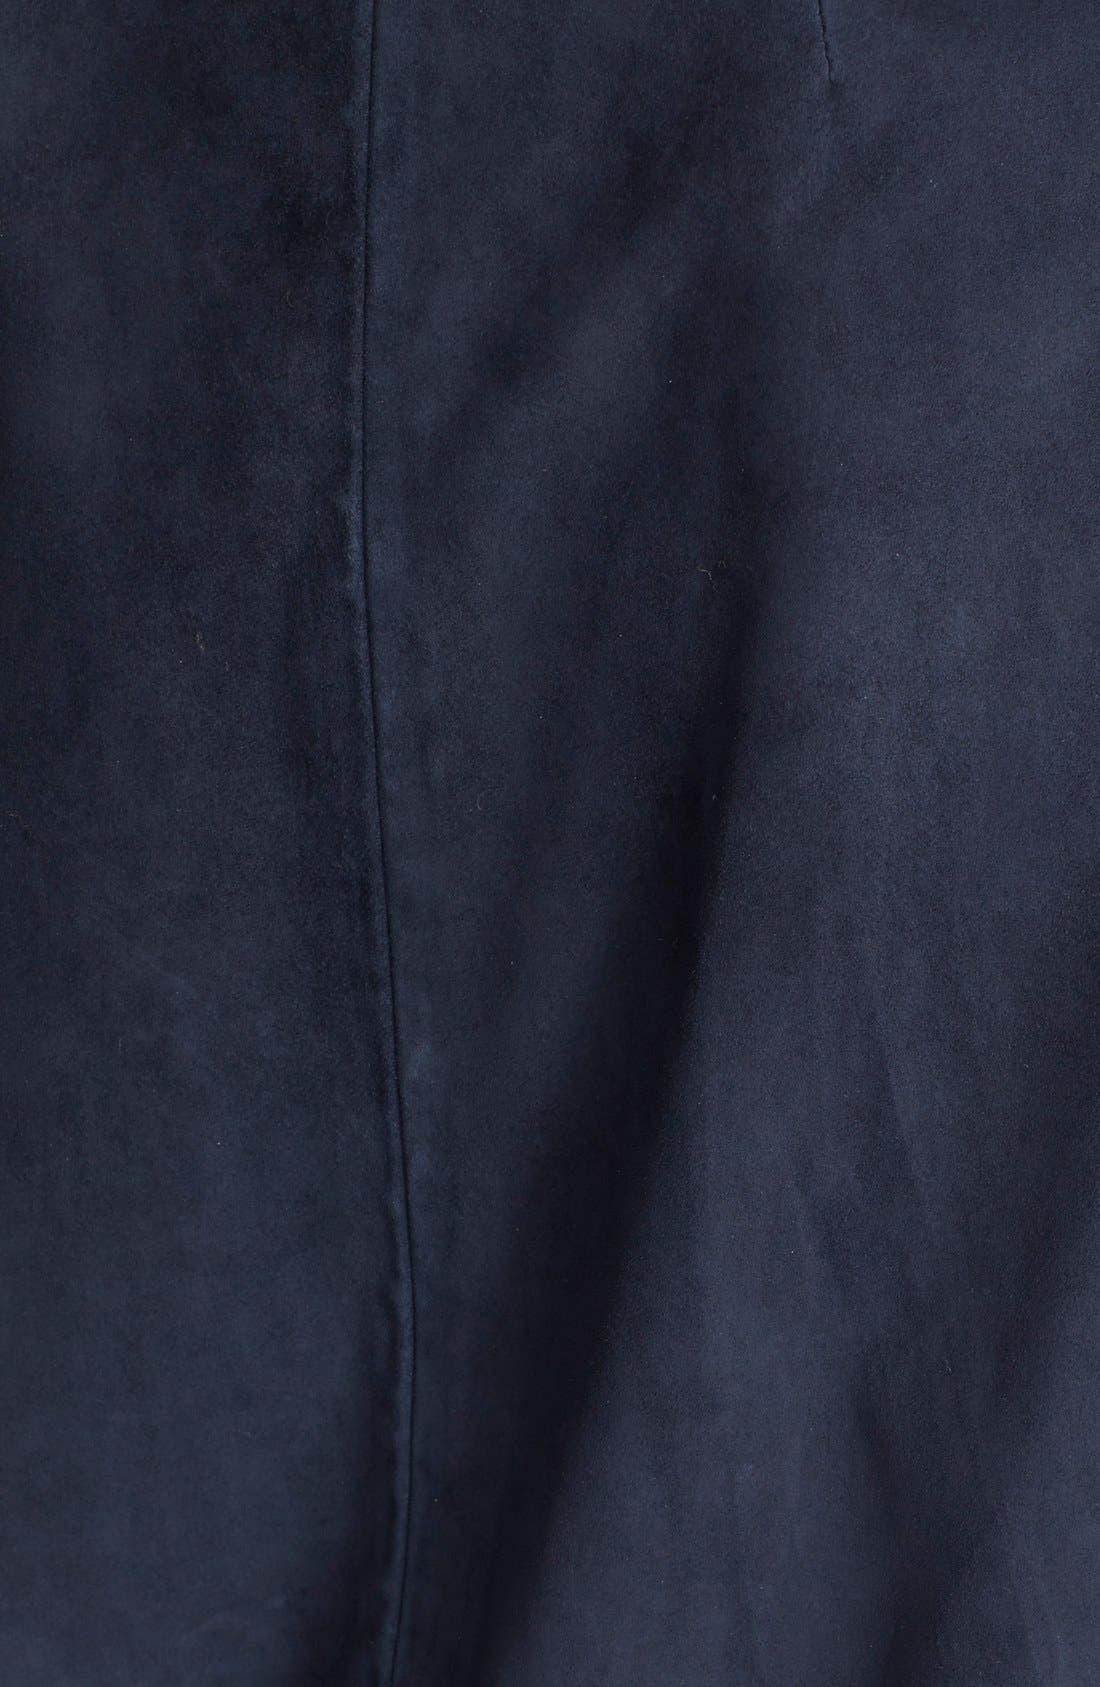 THEORY,                             'Venizka' Bonded Suede Jacket,                             Alternate thumbnail 2, color,                             410